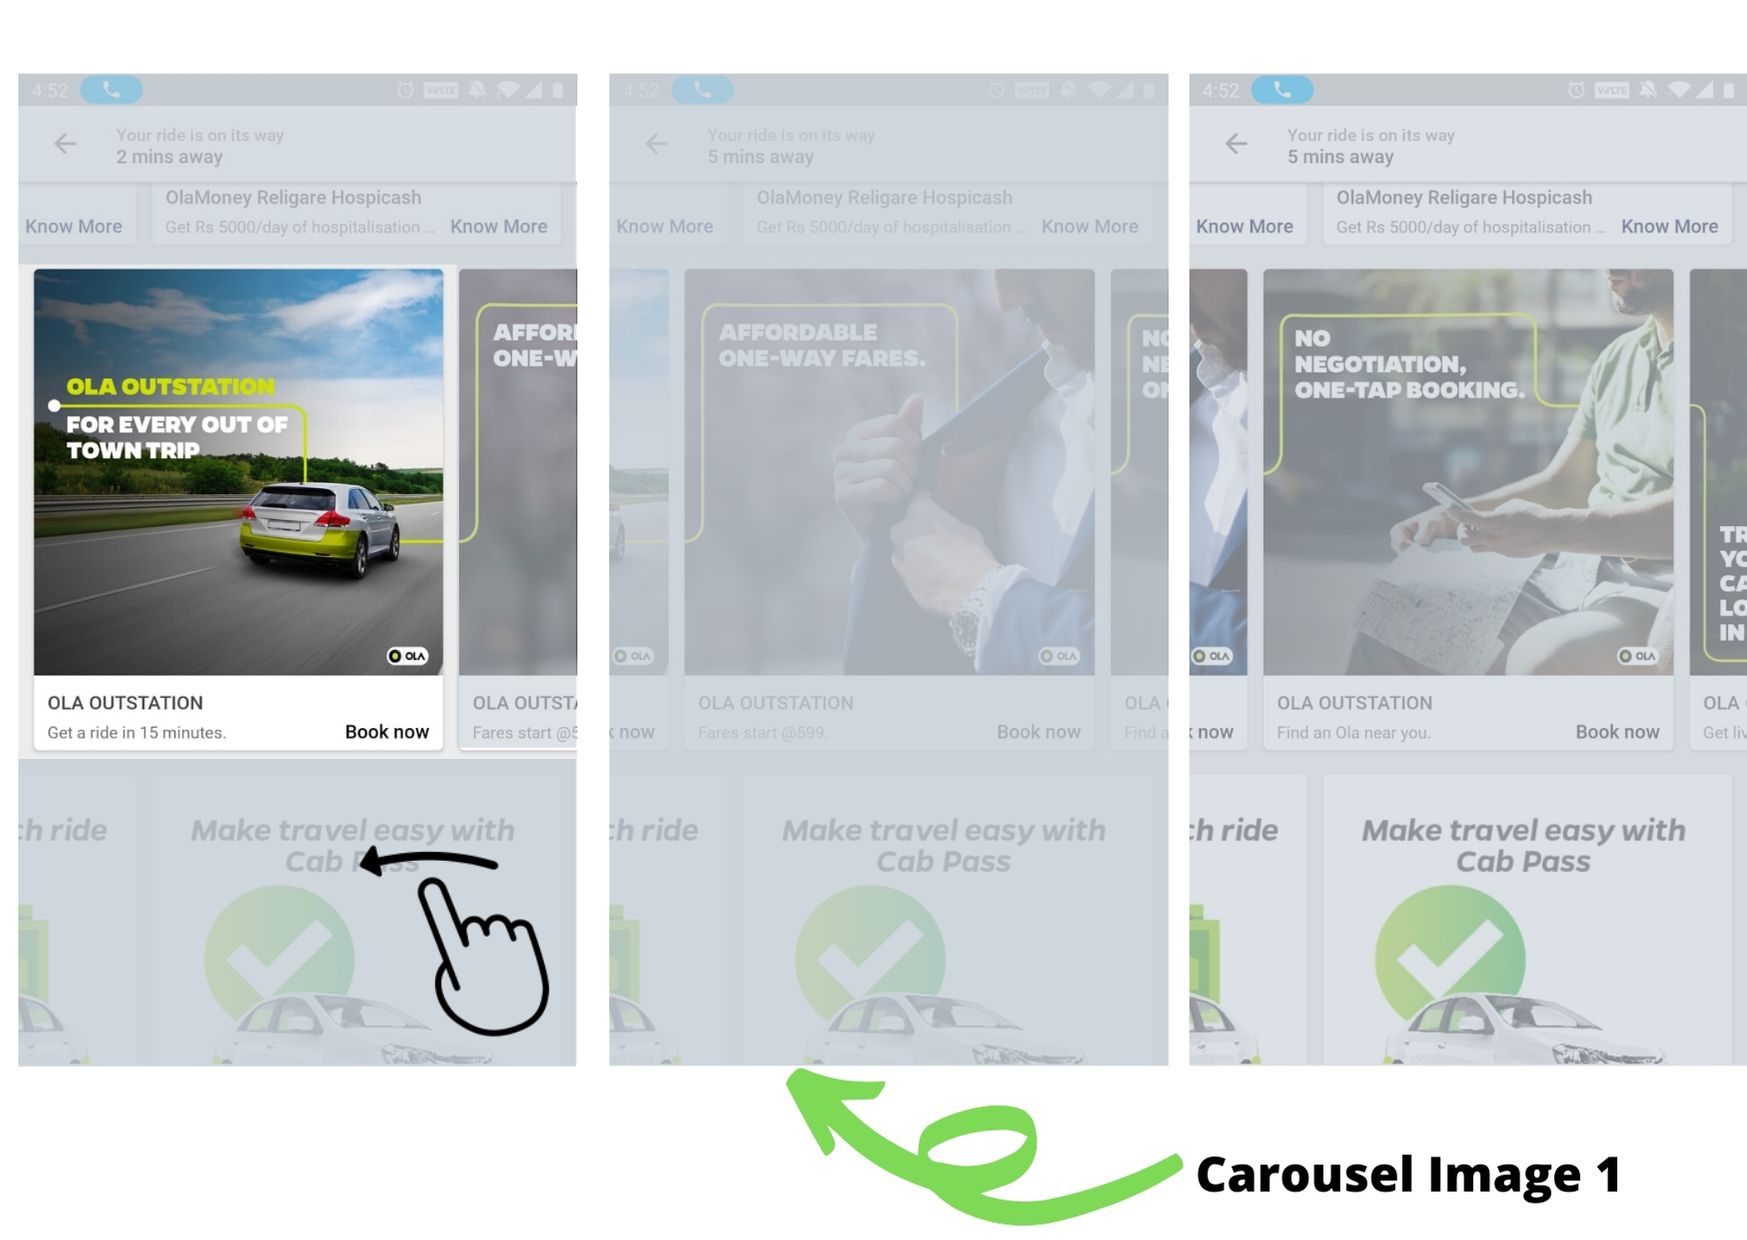 OLA, App Advertising Option 1